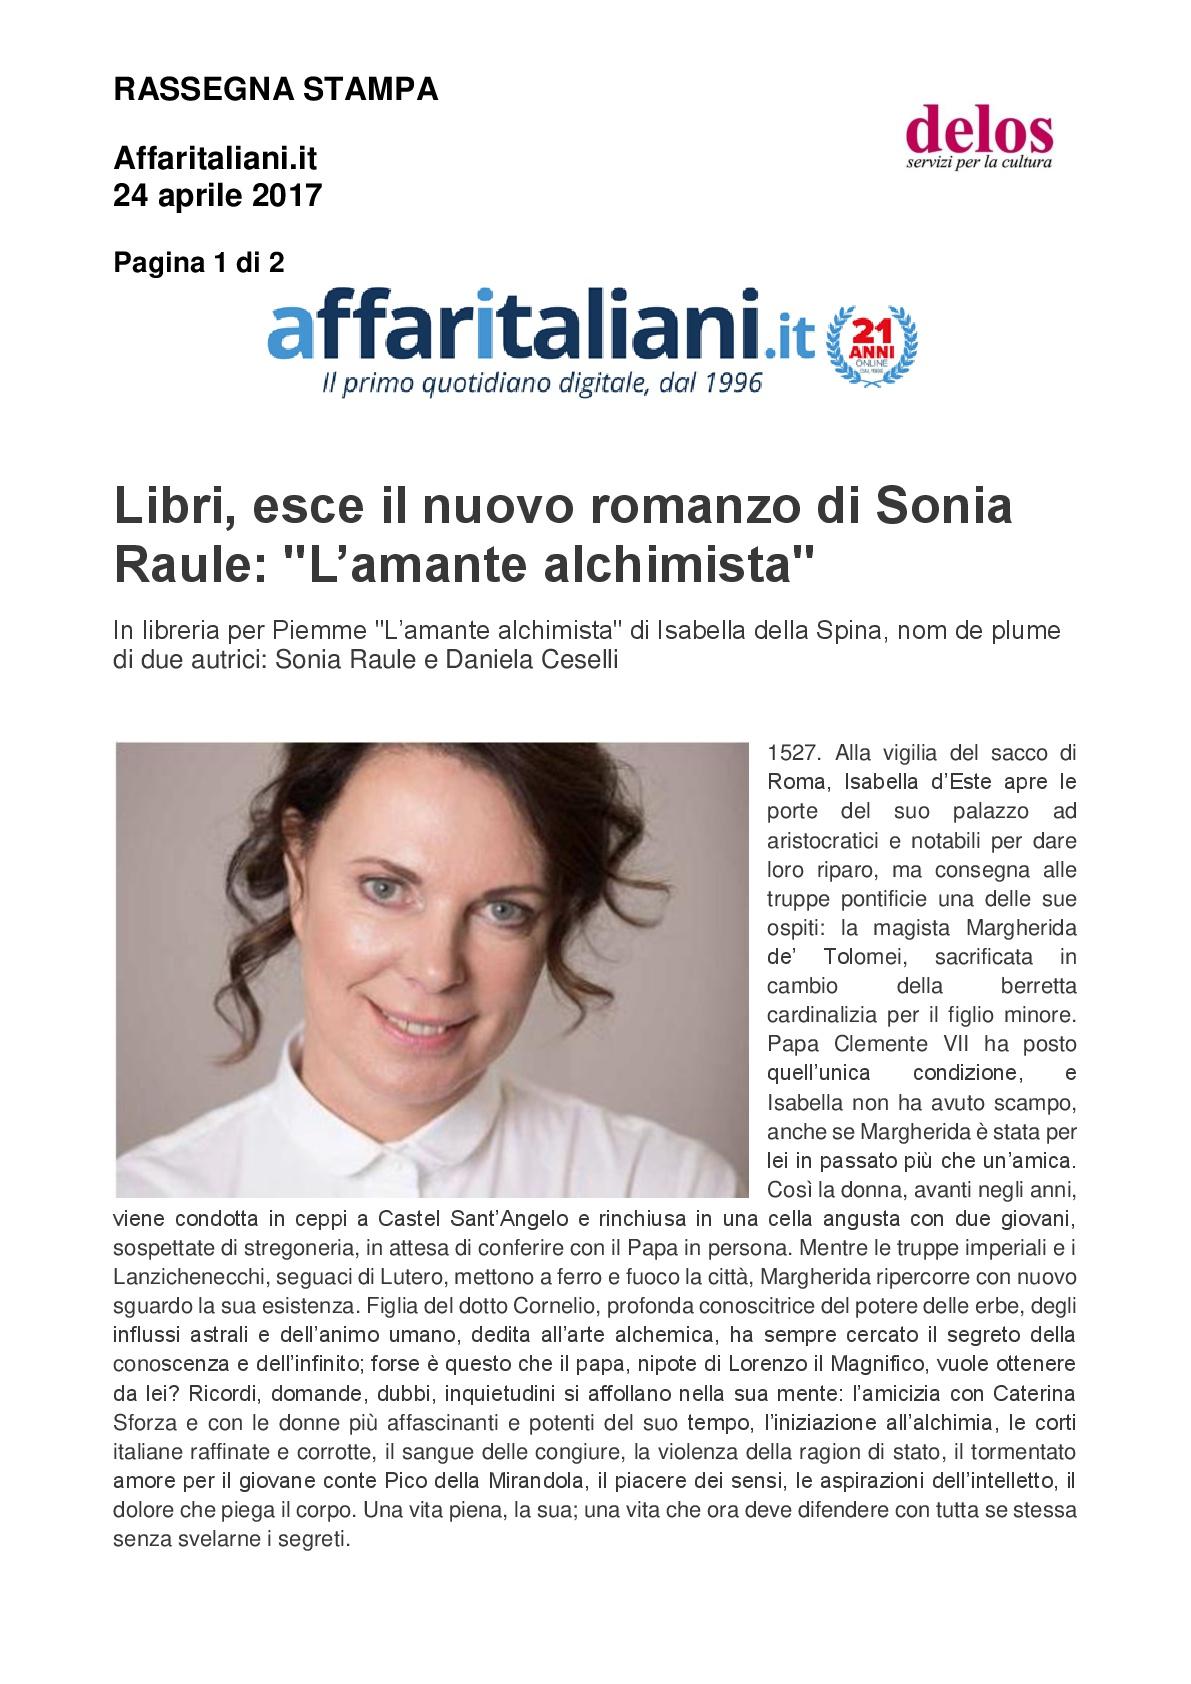 Affaritaliani.it 24-04-2017 001